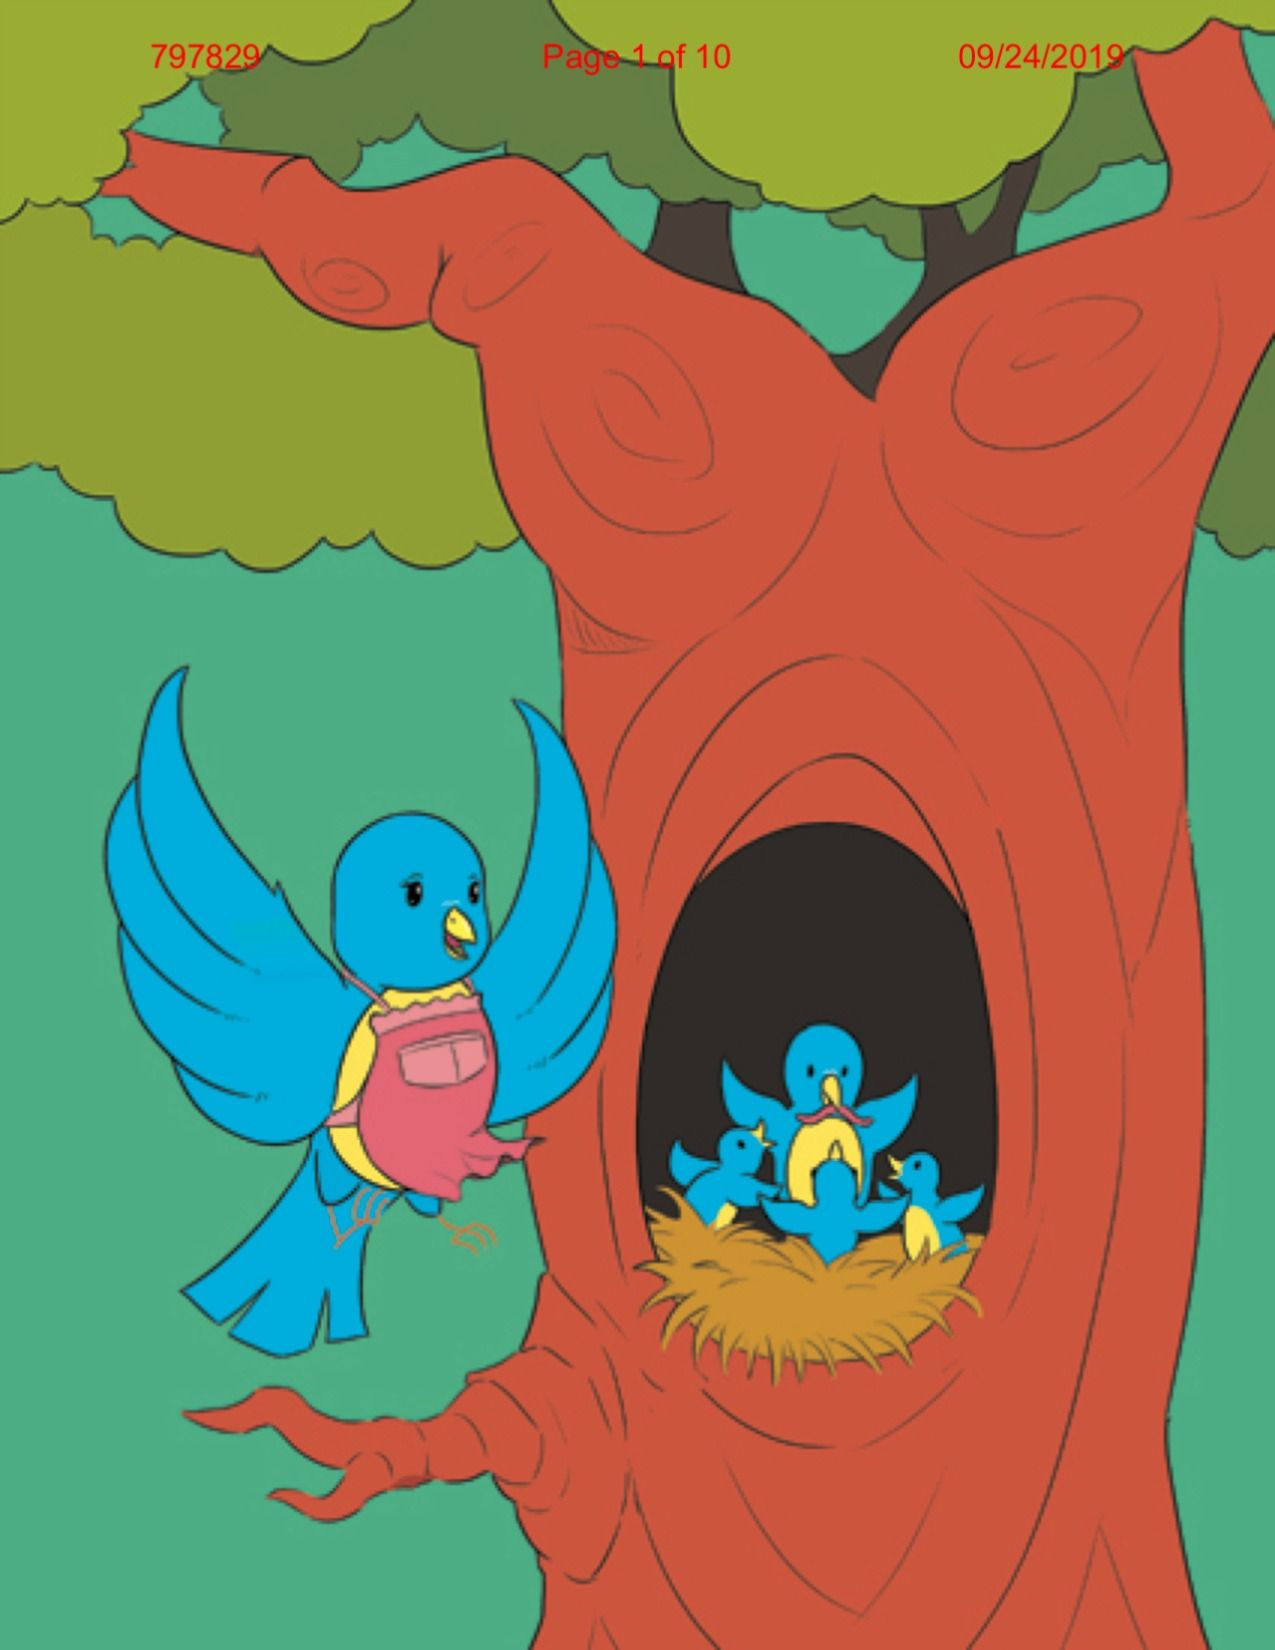 Beautifully illustrated little blues runaway adventure